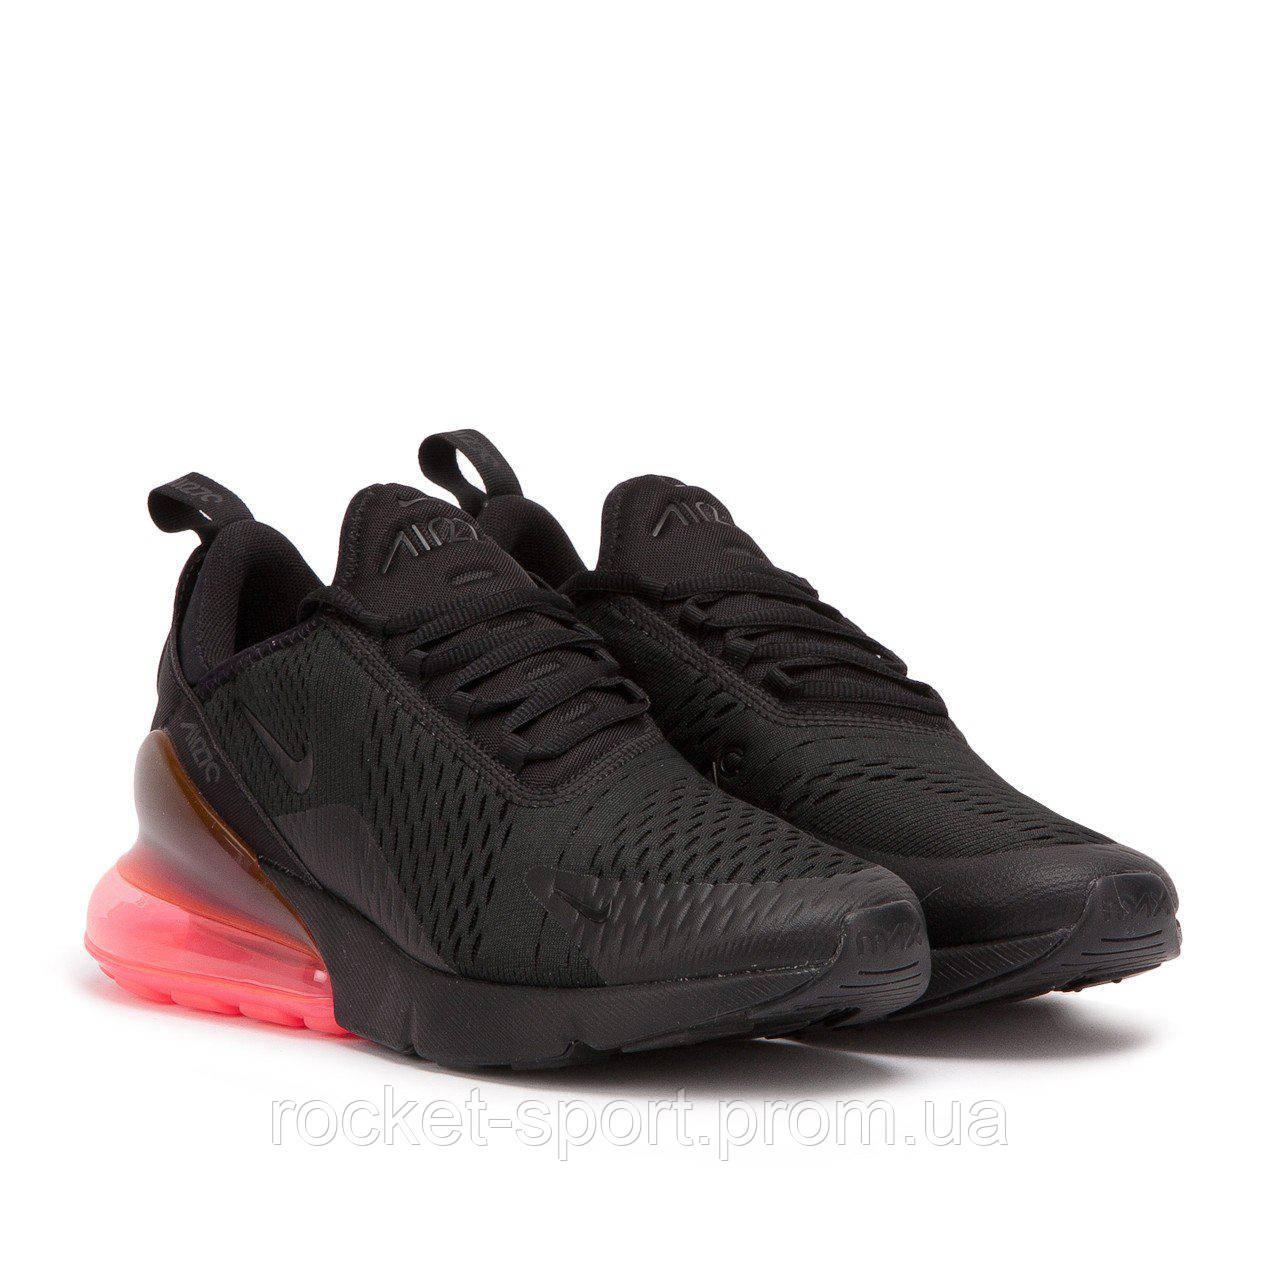 80ff1e17 Женские кроссовки Nike Air Max 270